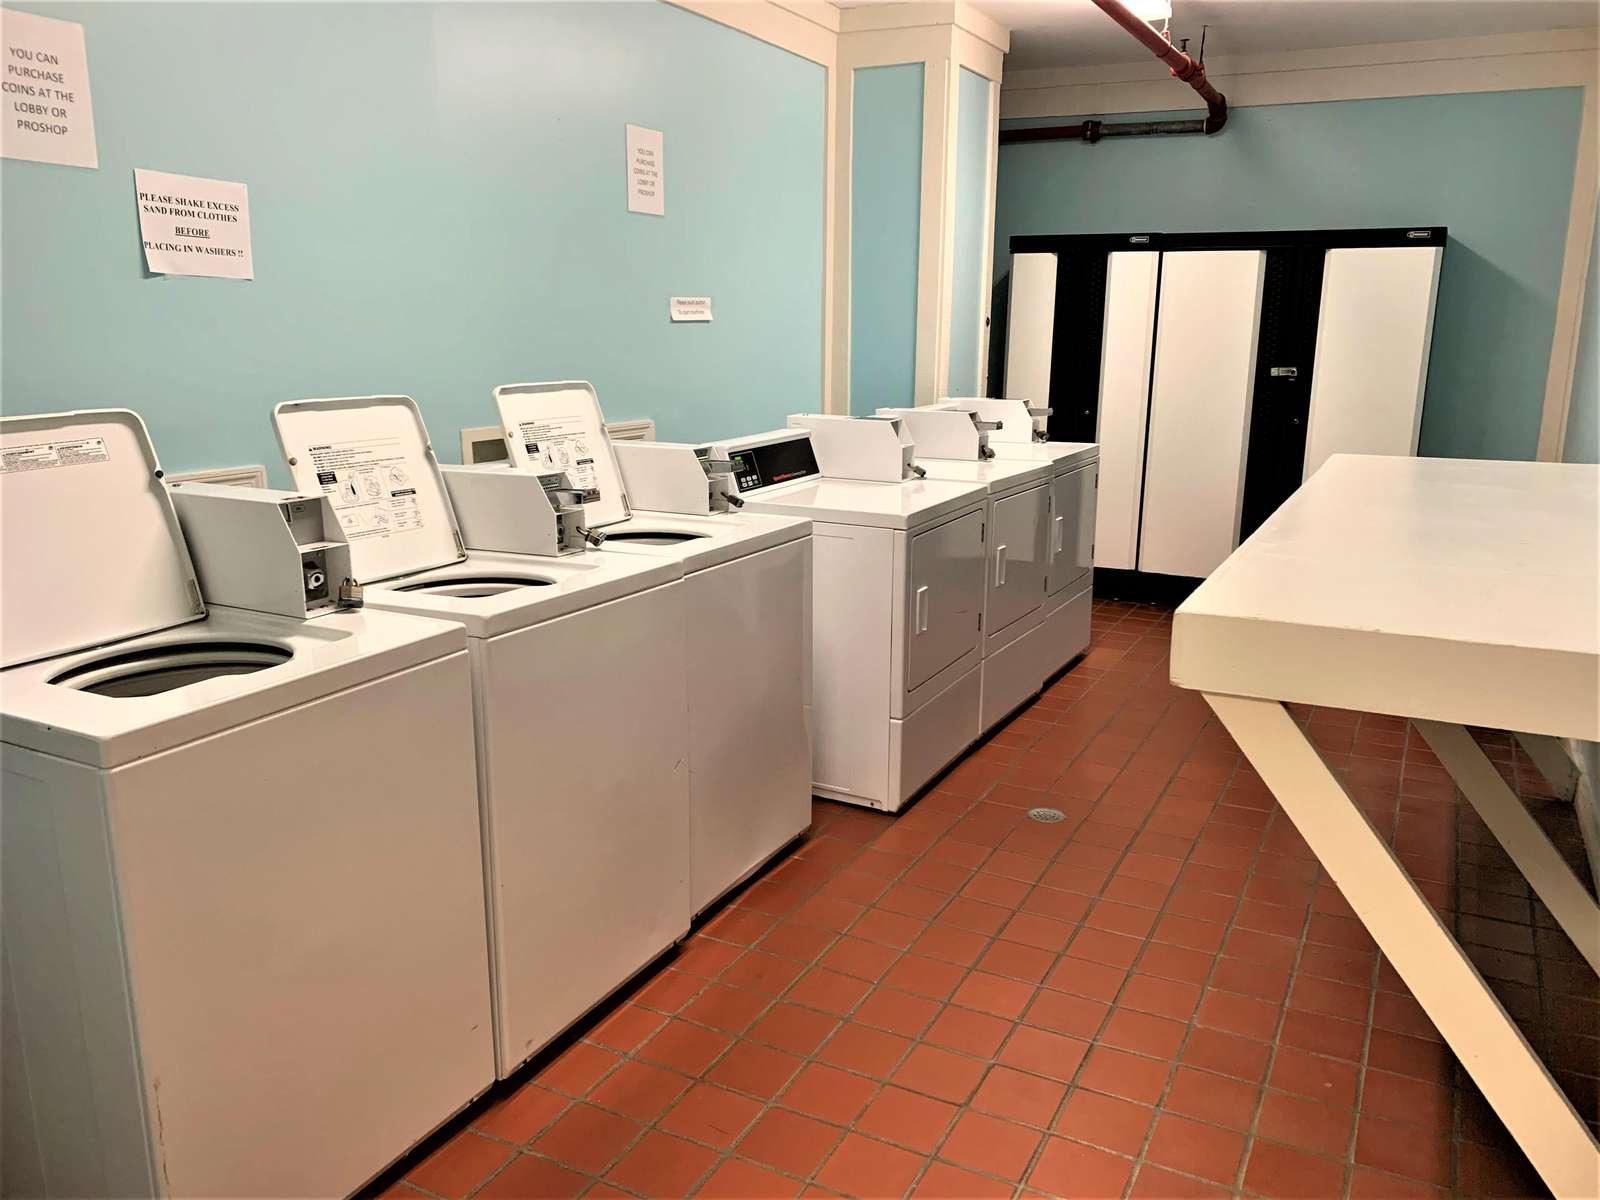 Laundry Room on 2nd floor